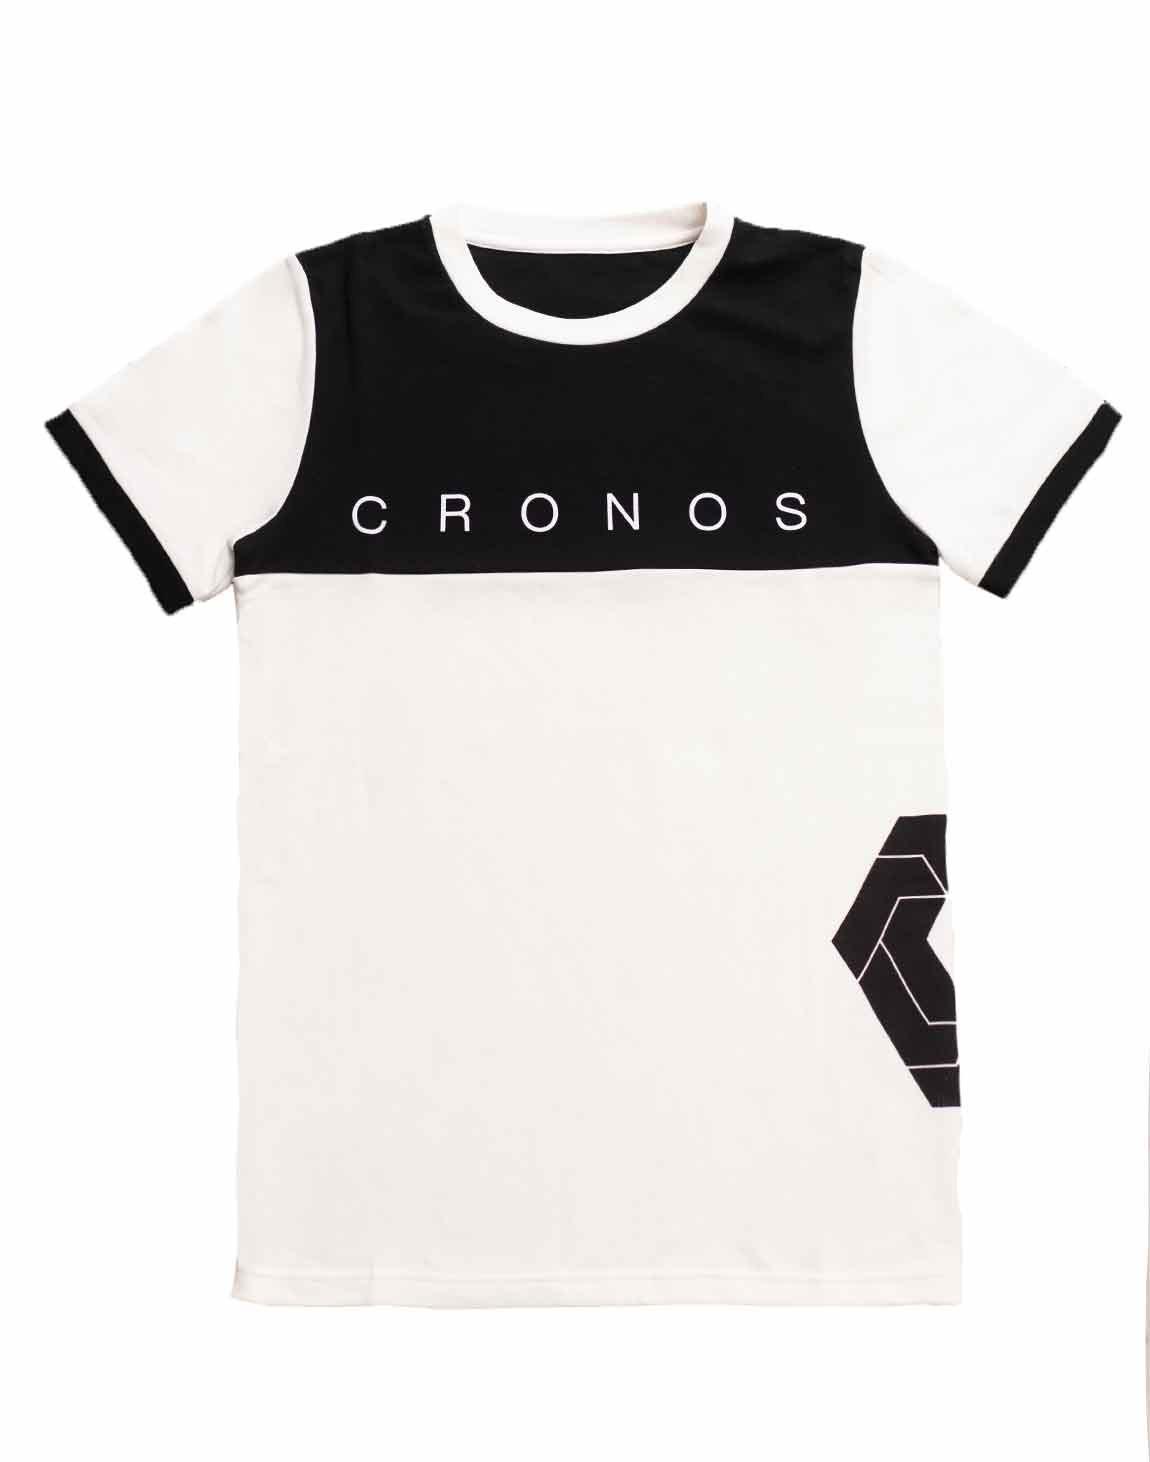 CRONOS Bi-COLOR SIDE LOGO T-SHIRTS【WHITE×BLACK】